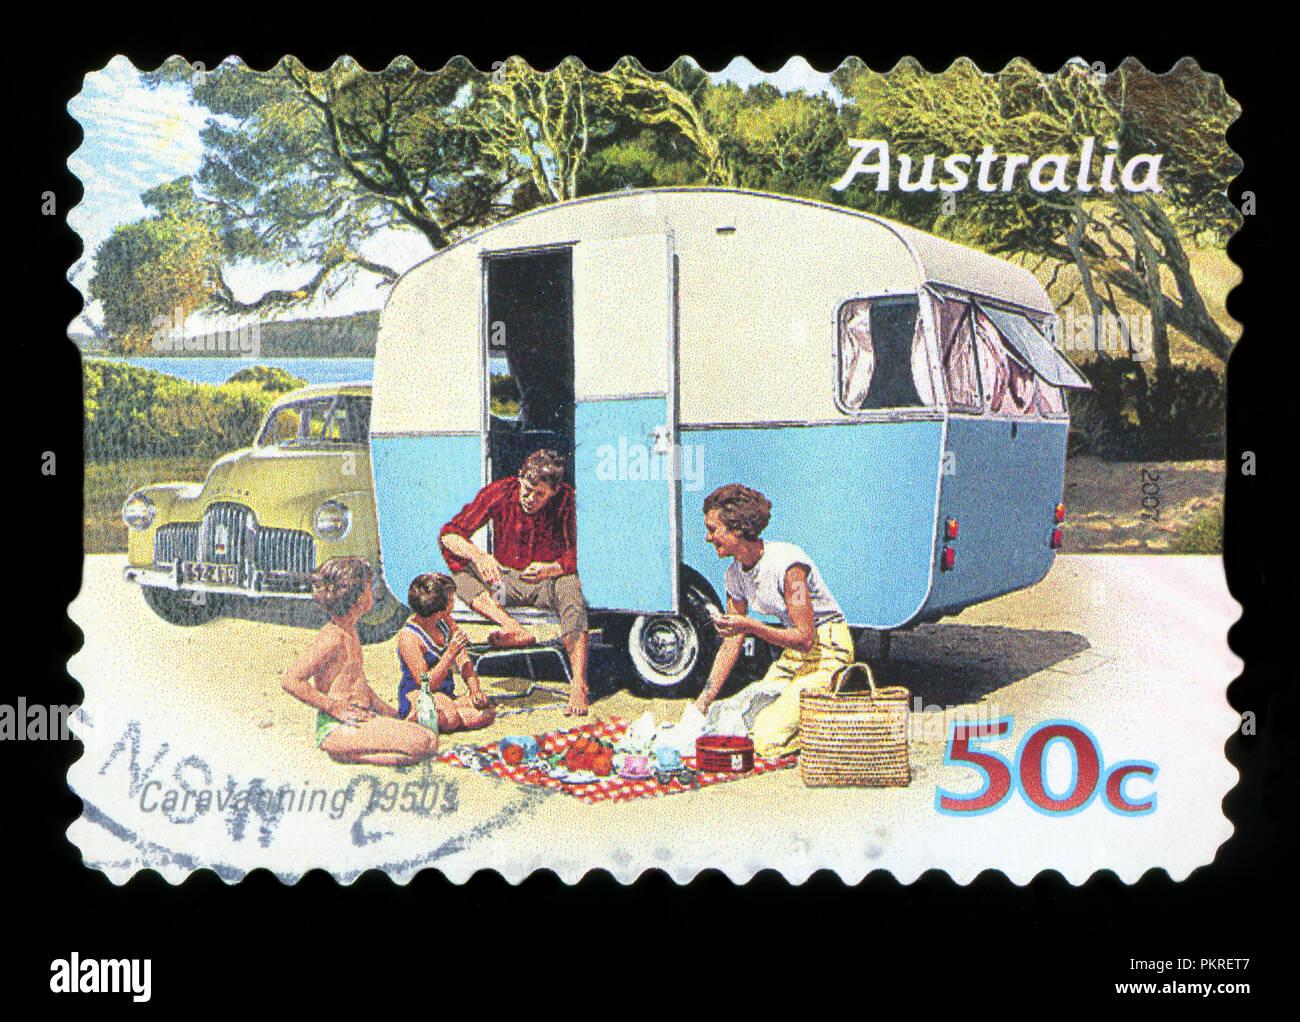 AUSTRALIA - CIRCA 2007: A stamp printed in australia shows Family enjoying a caravan of the 50s, caravanning 1950s, circa 2007 - Stock Image